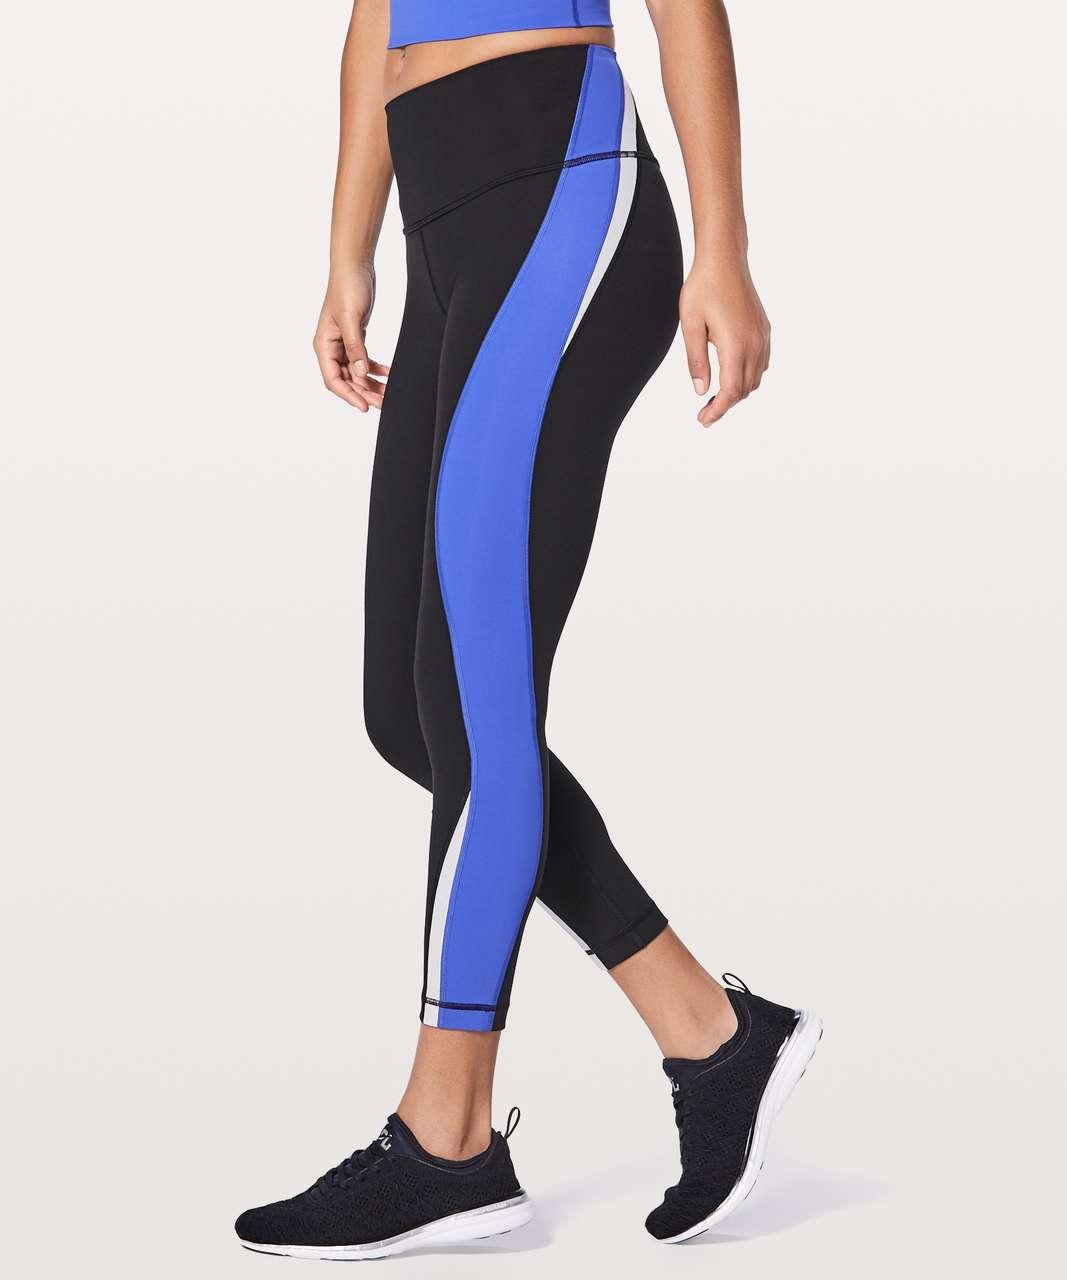 "Lululemon Kick Serve Sweat Tight 25"" - Black / Blazer Blue / White"